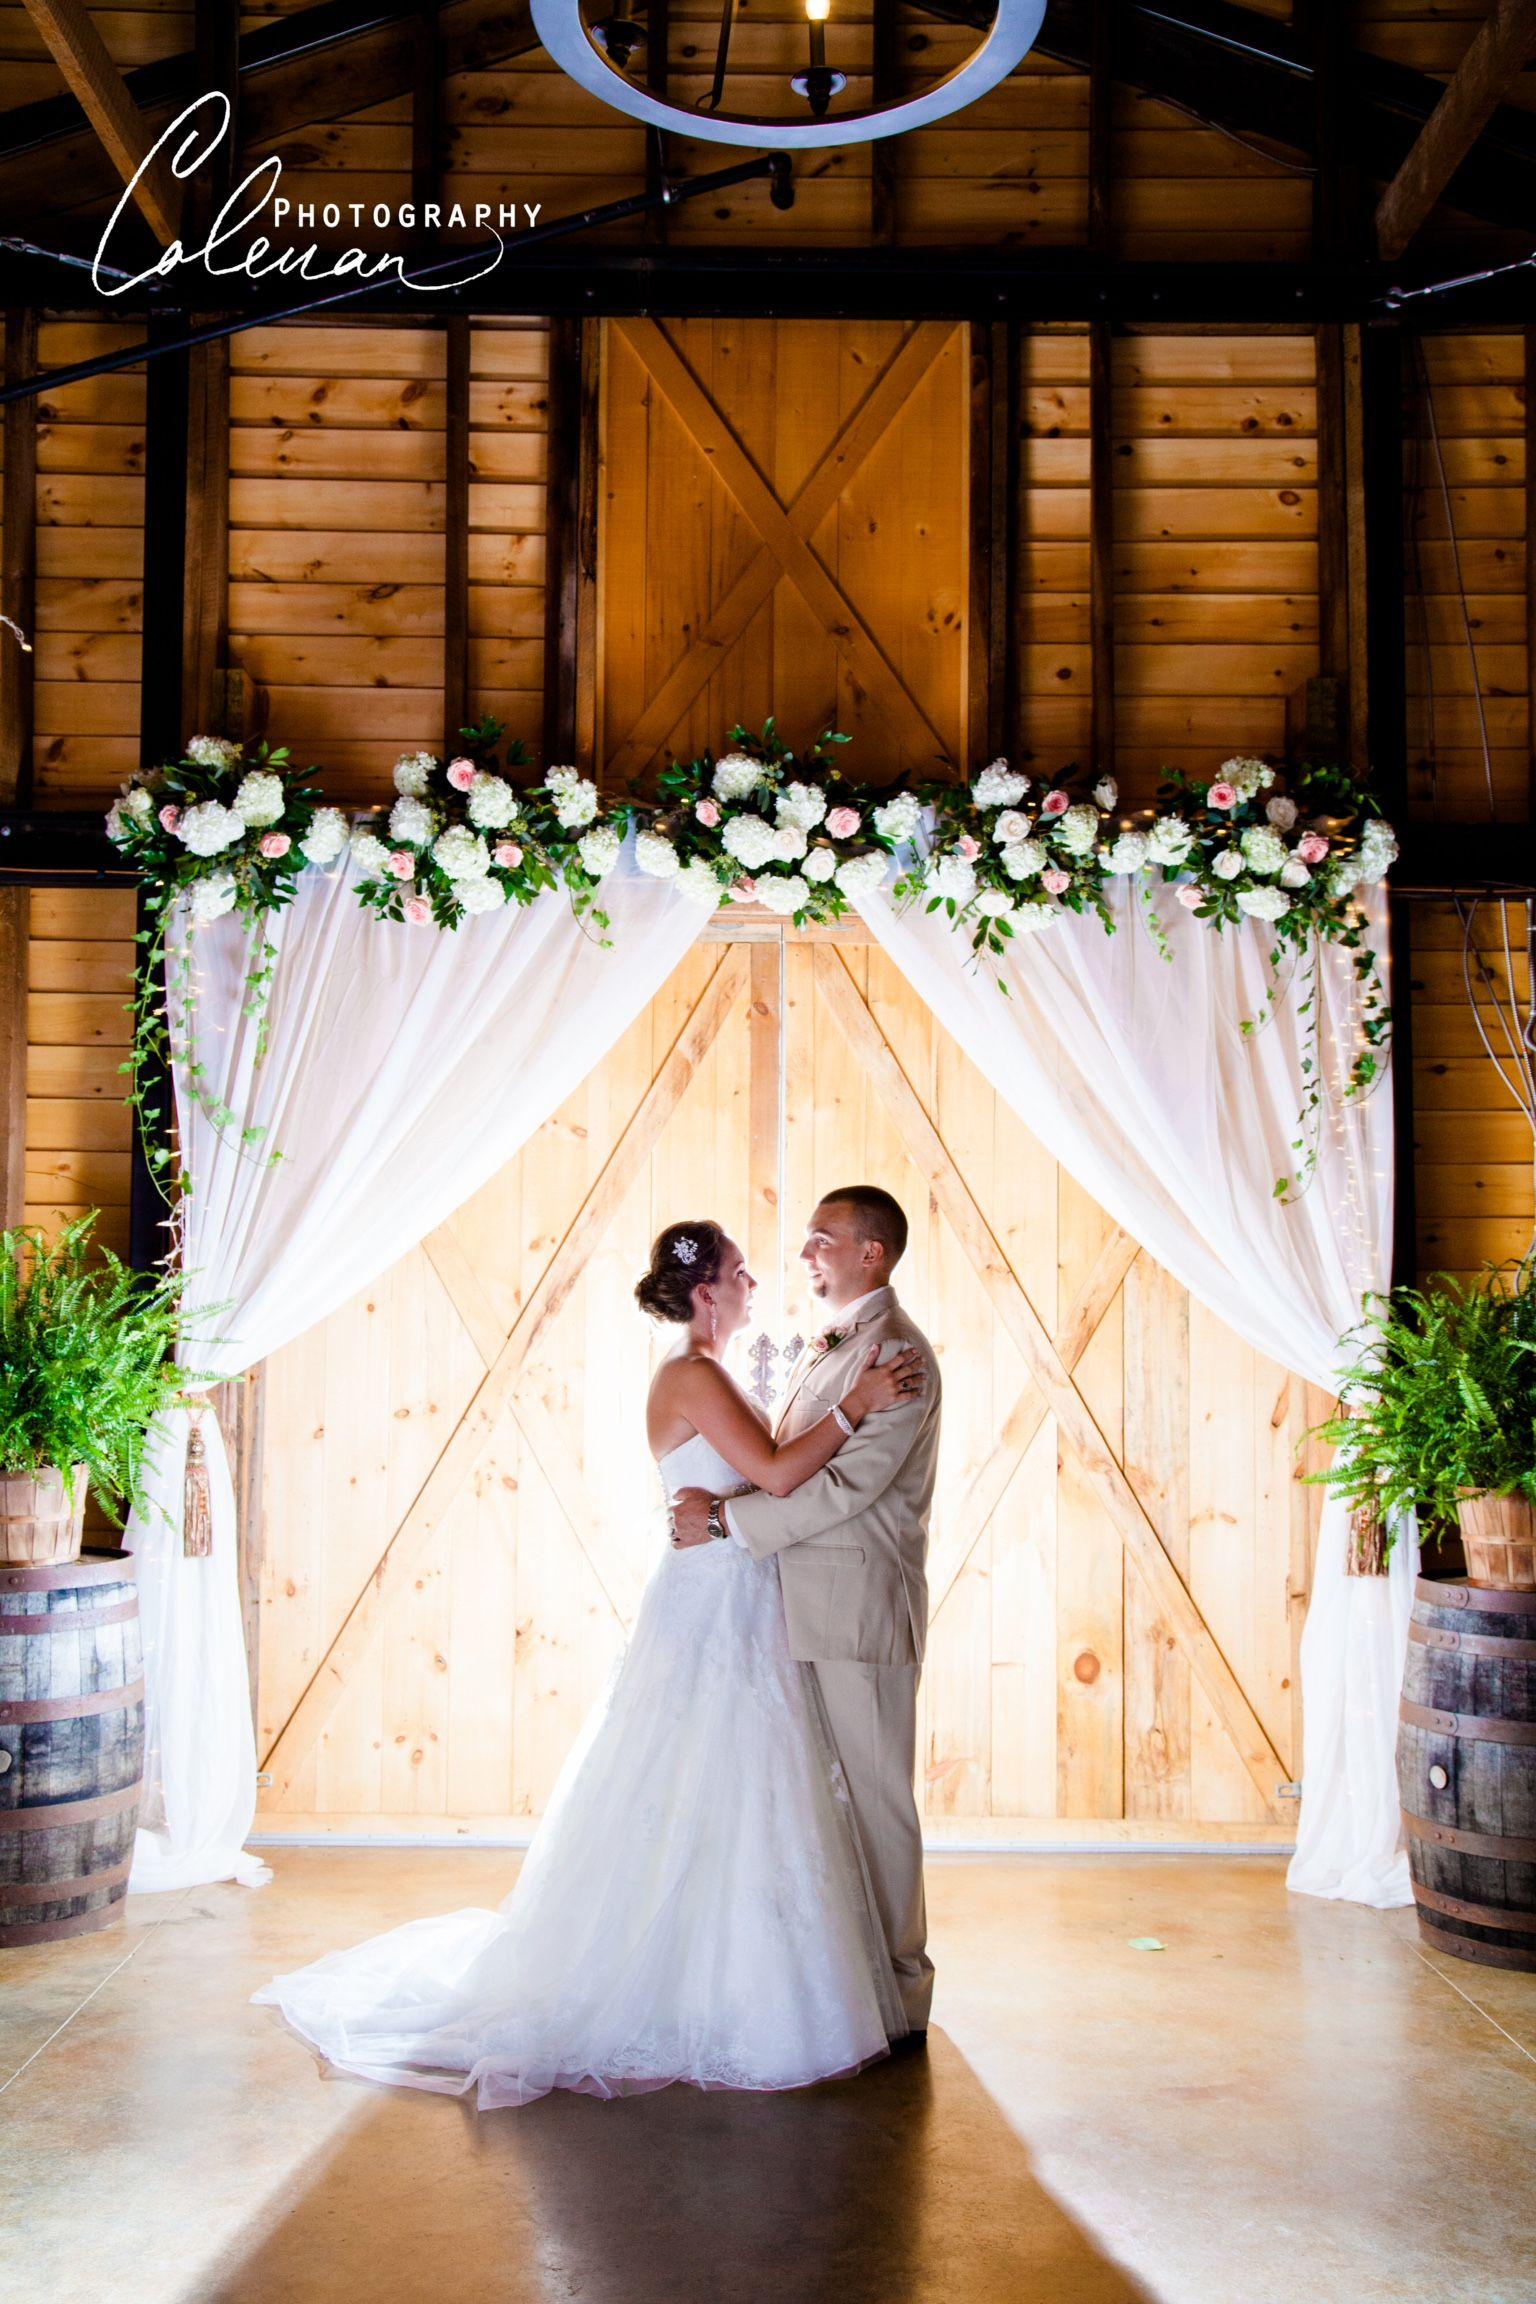 elegant rustic wedding 9oaksfarm.com flowersbyon.com ...